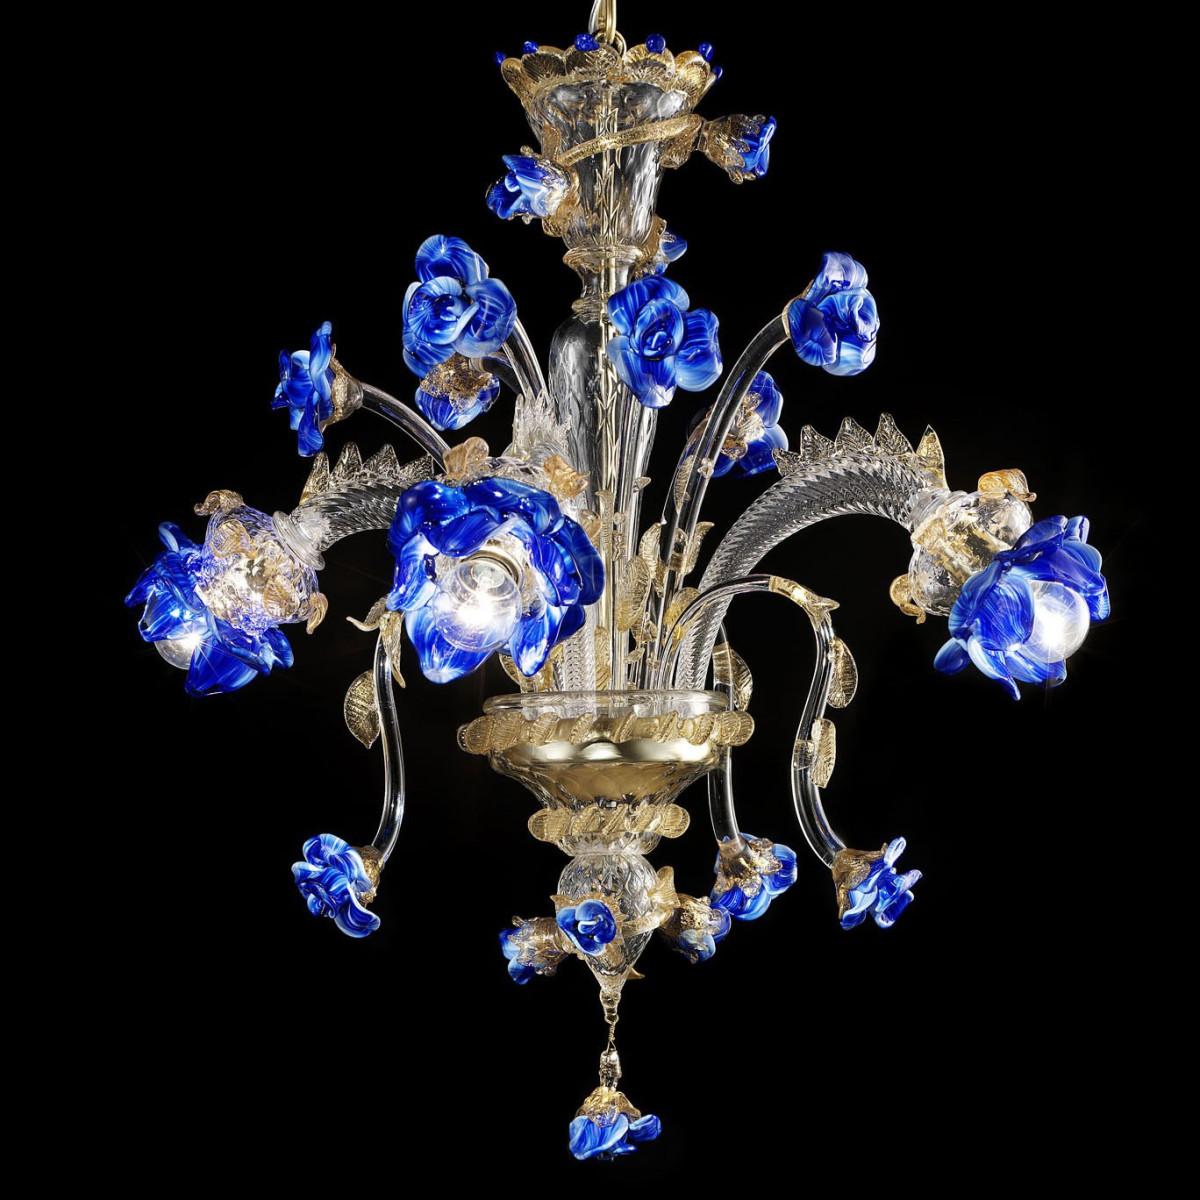 """Manin"" Murano glas Kronleuchter - 3 flammig - transparent gold blau farbe"